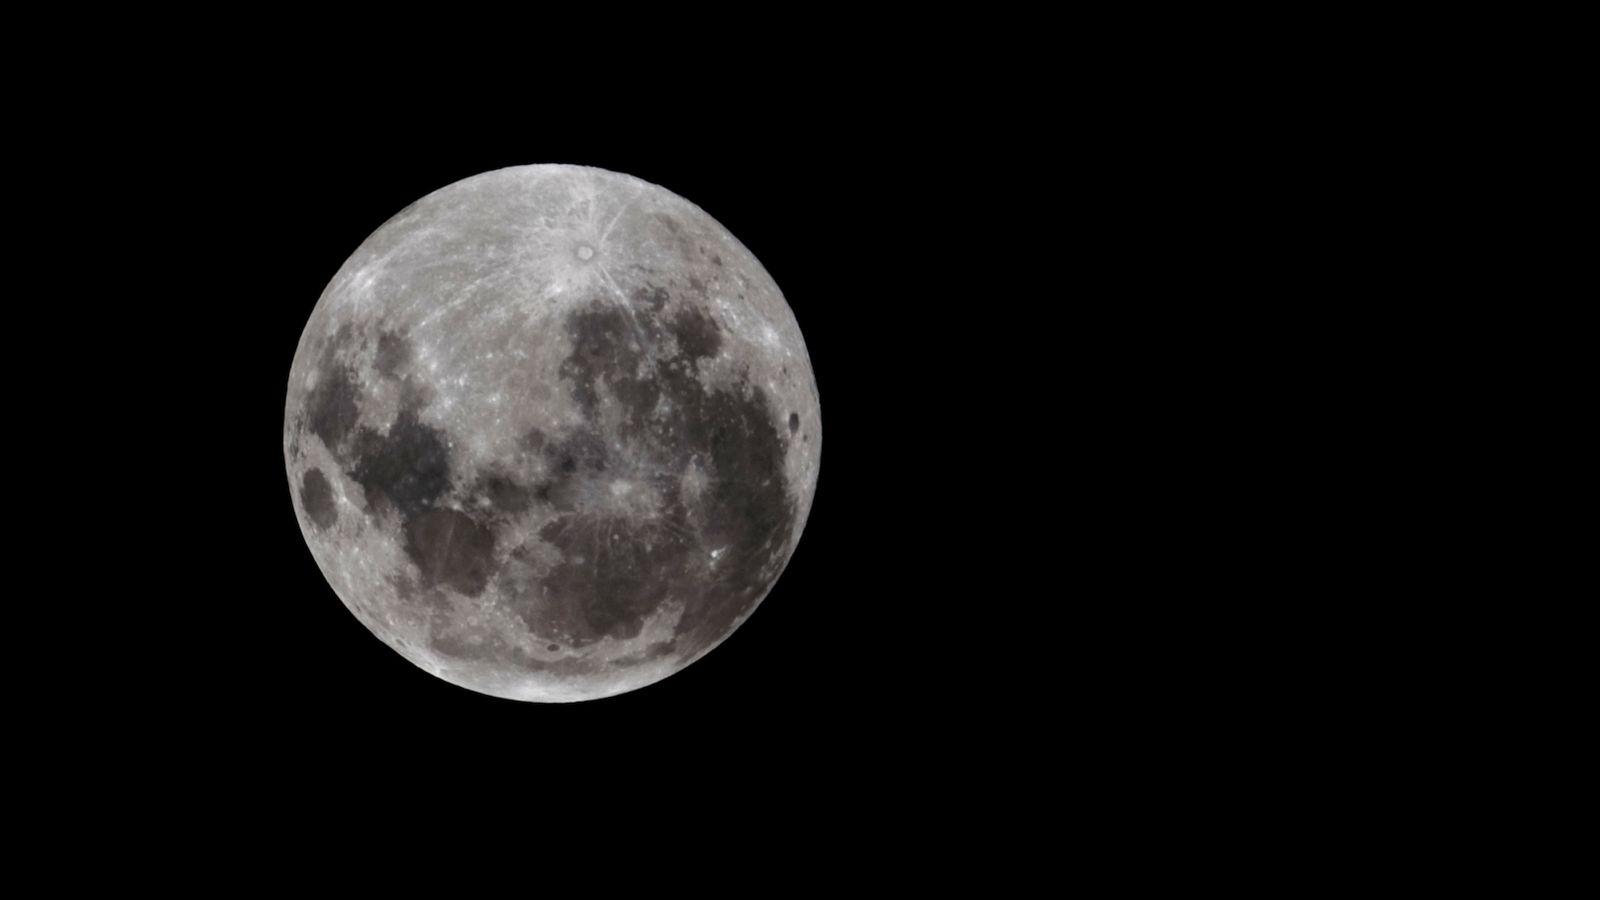 luna space station - photo #36